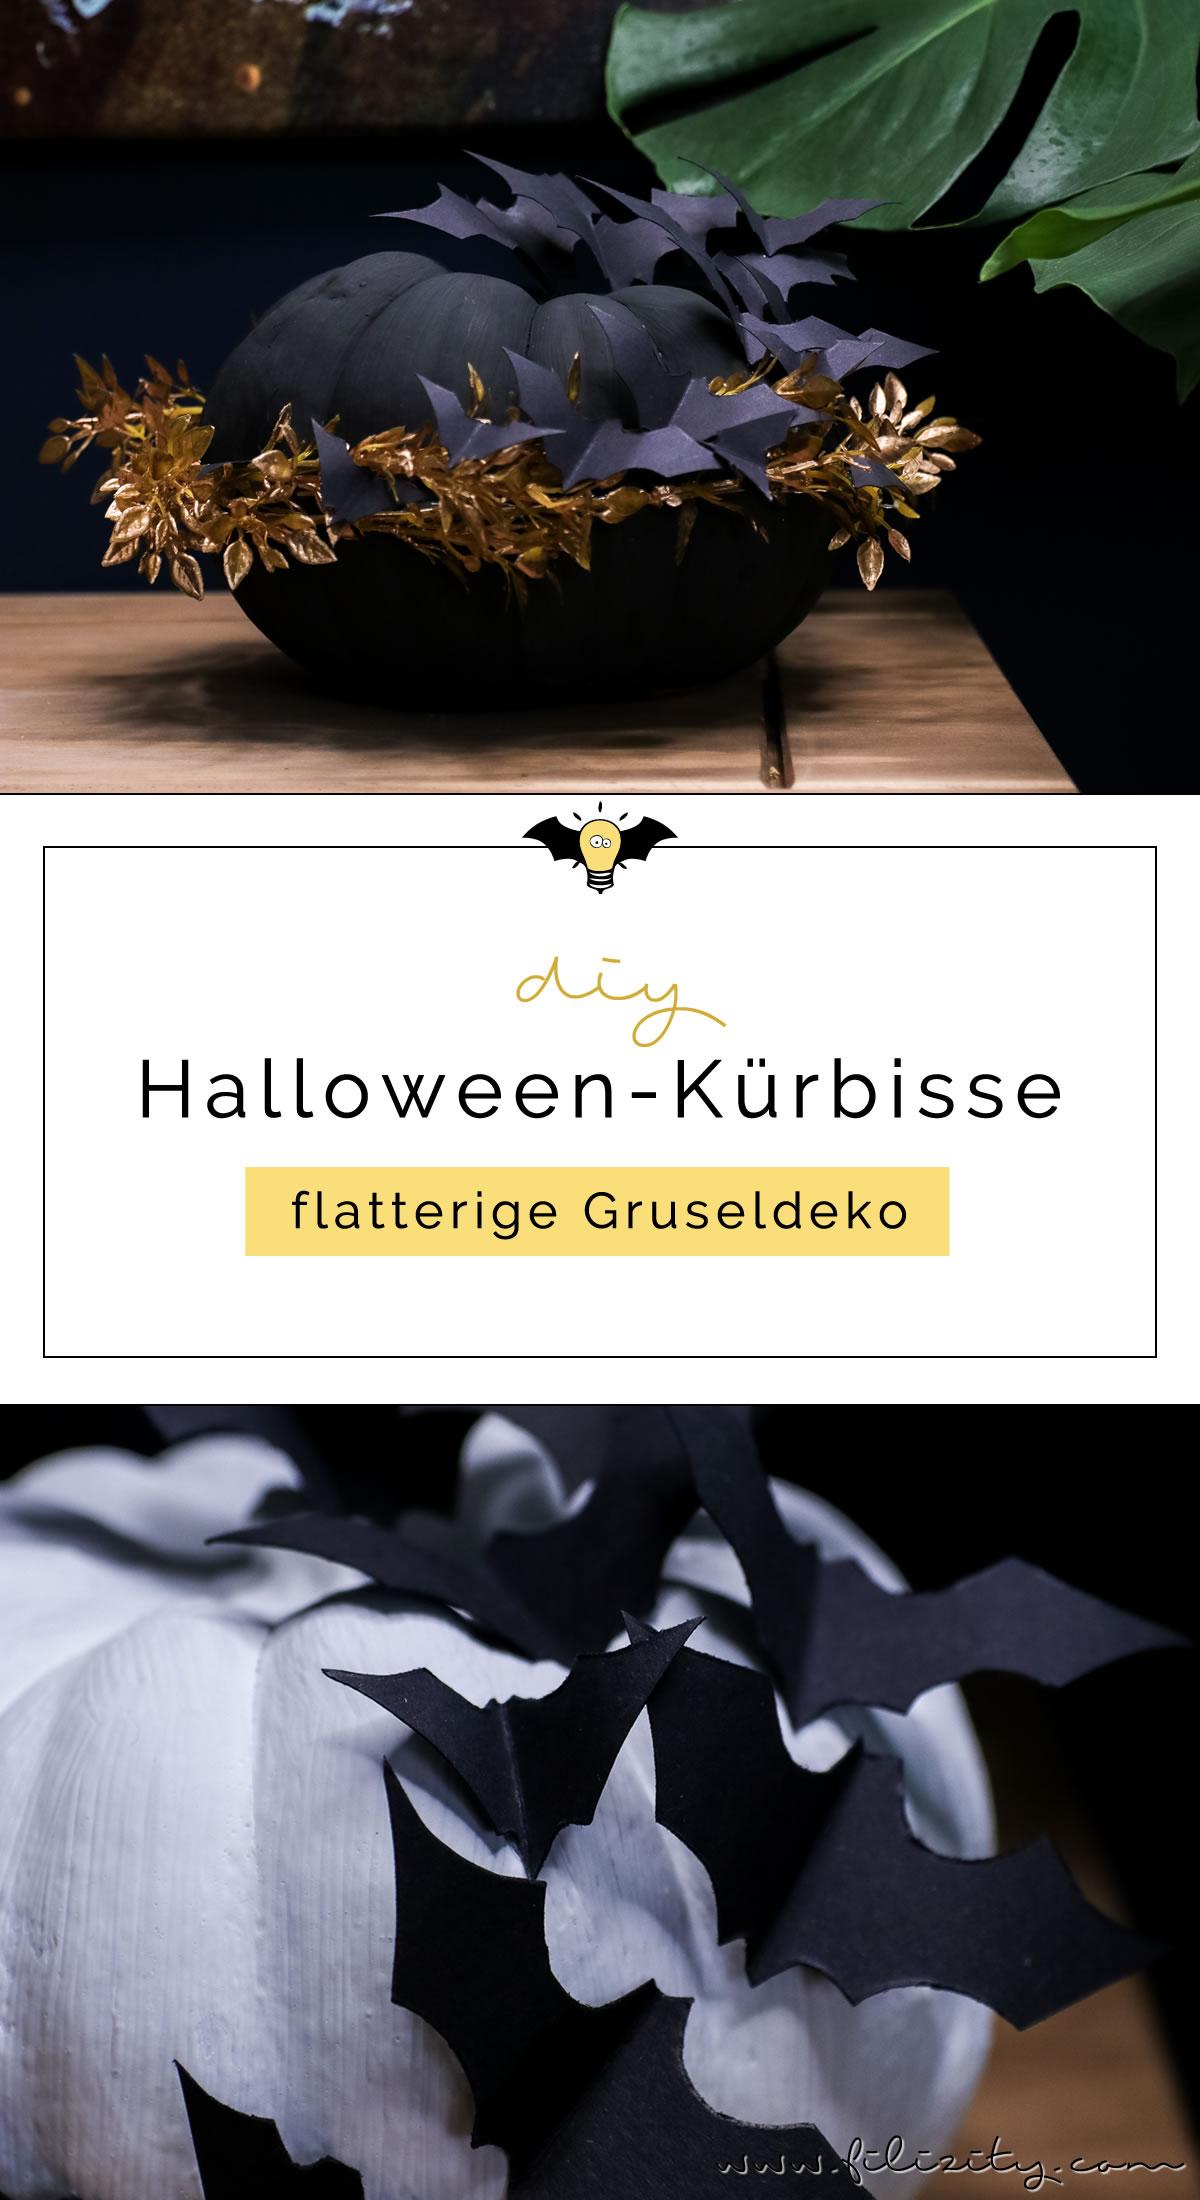 DIY Halloween-Deko selber machen: Kürbisse mit Fledermäusen | Filizity.com | DIY-Blog aus dem Rheinland #halloween #booh #kürbis #styleyourkürbis